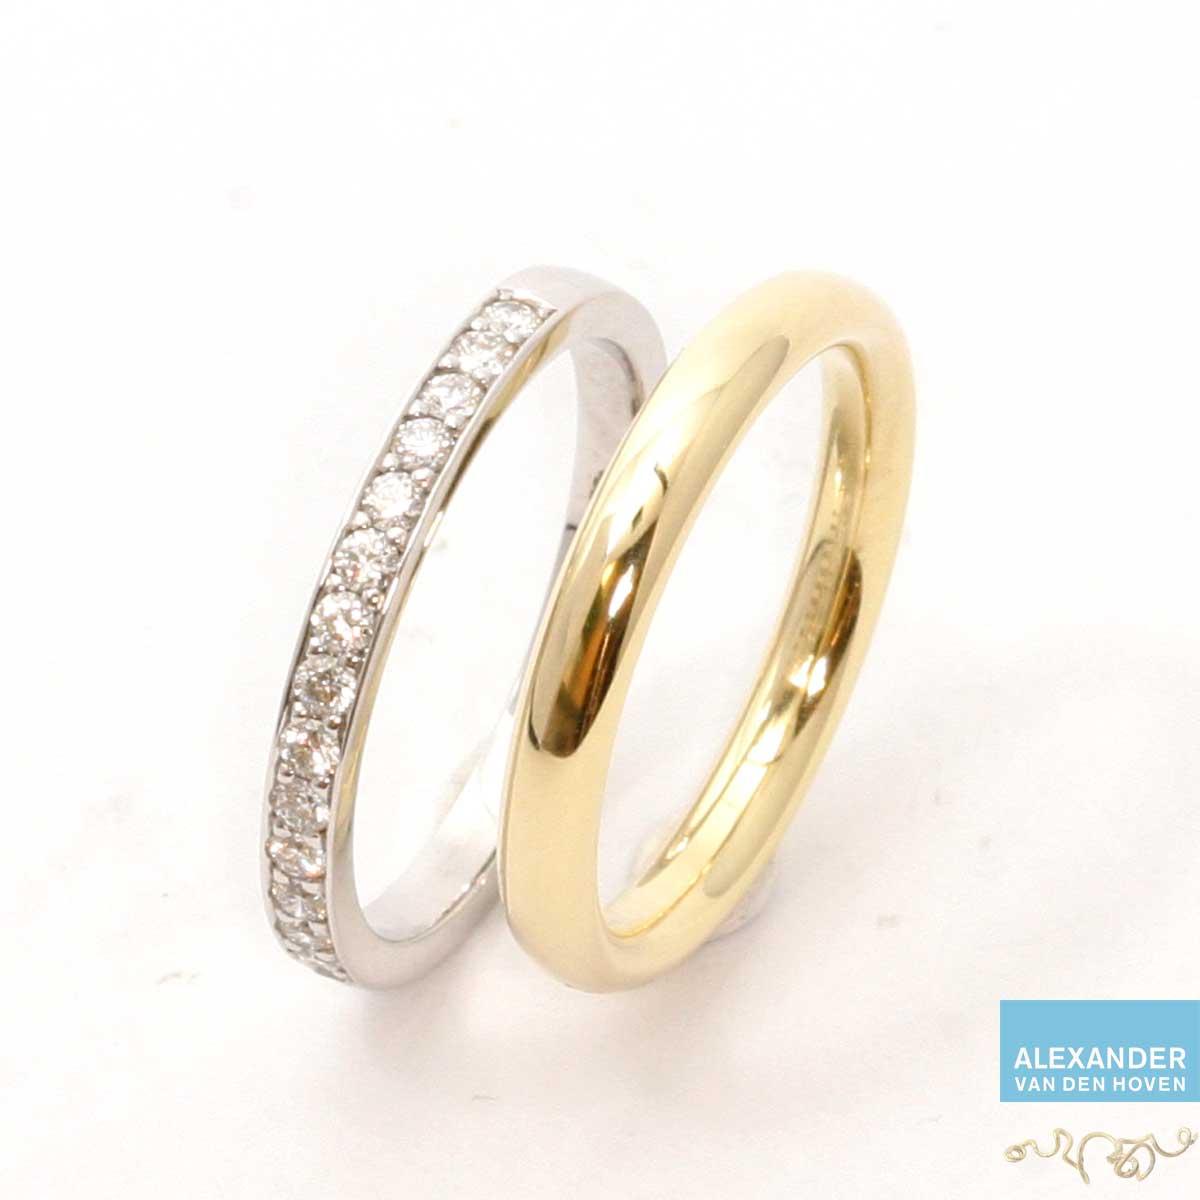 Gouden gladde trouwring met witgouden alliance ring